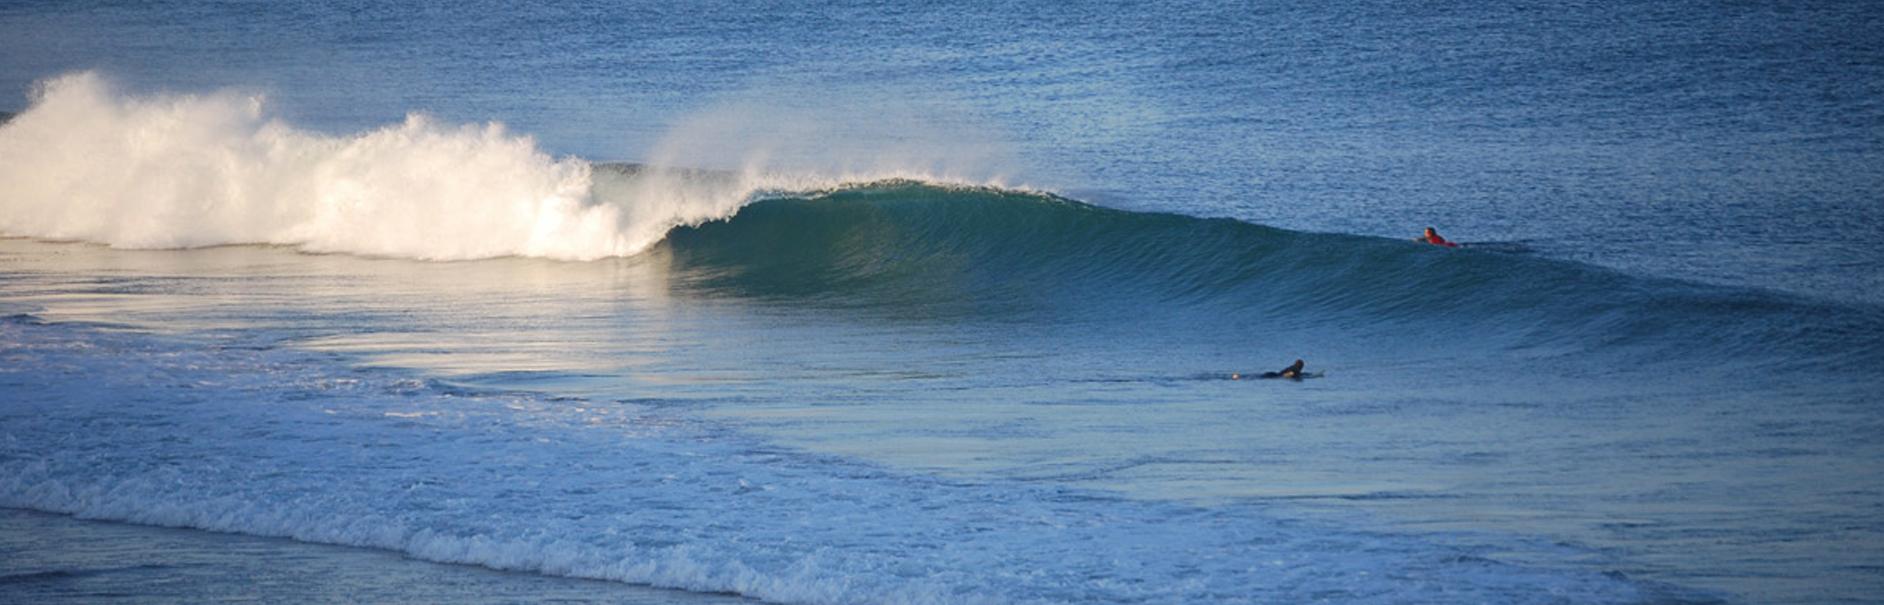 ruta-francia-surf